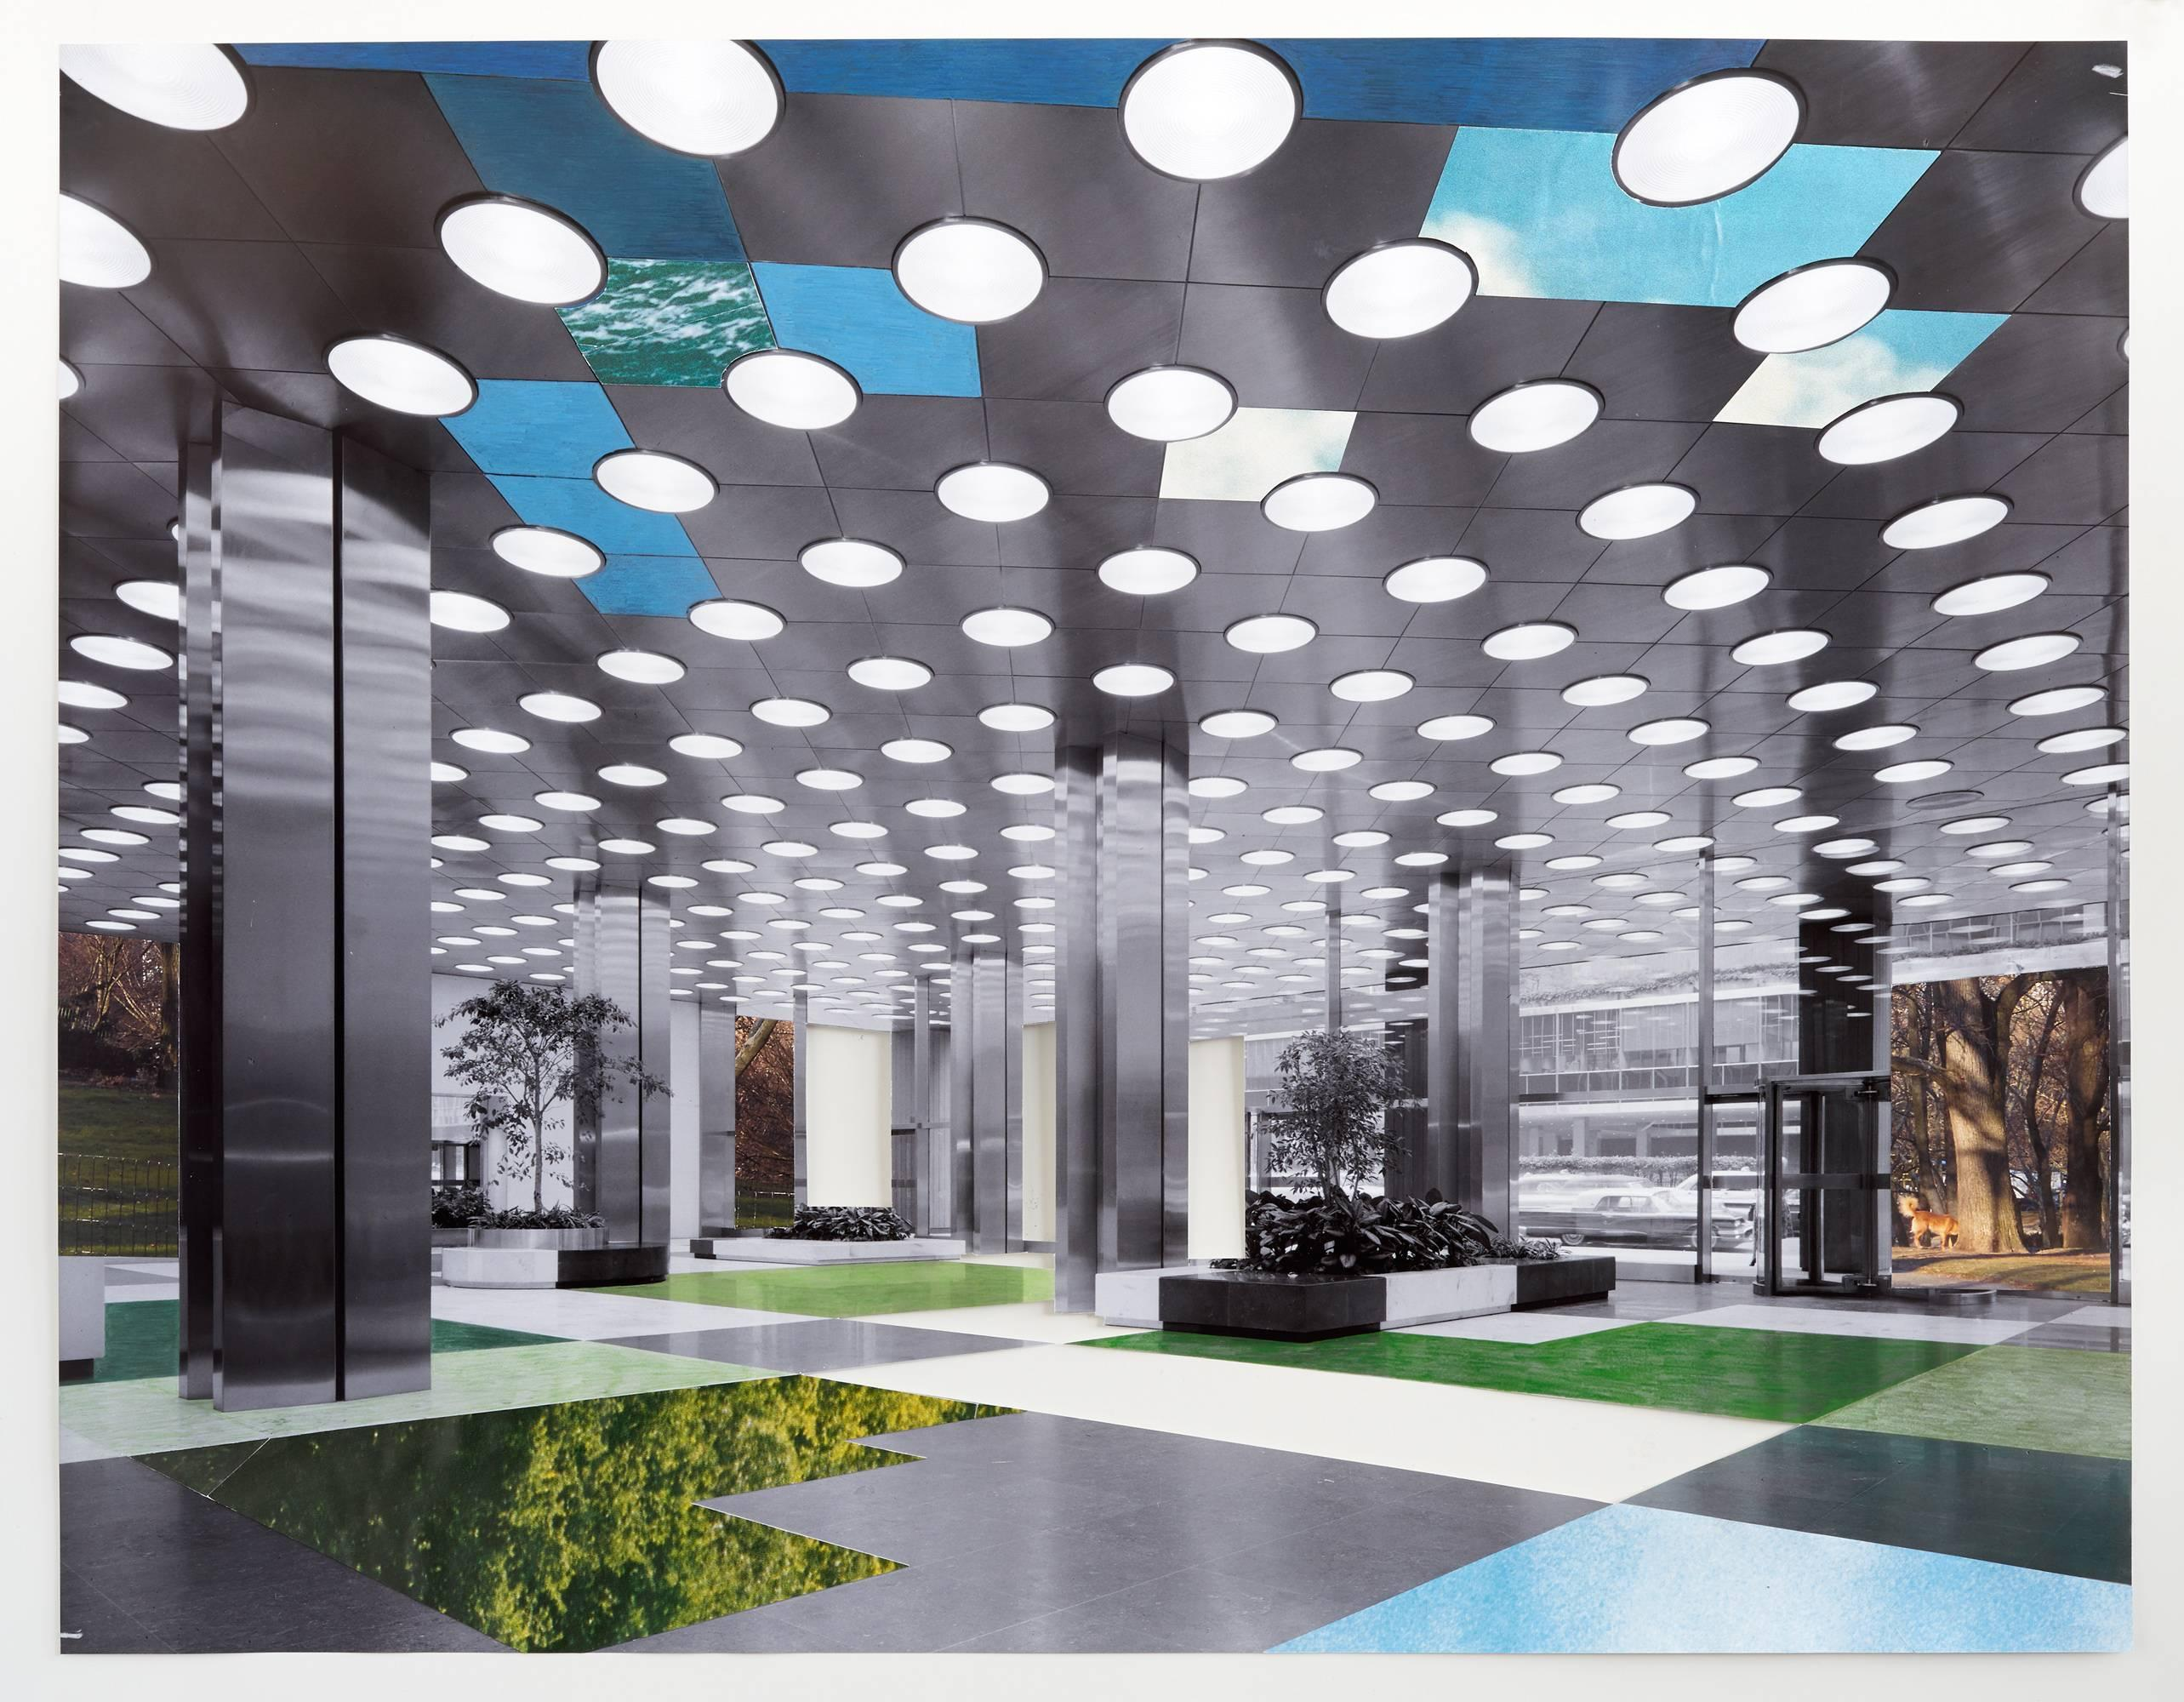 Lobby II, 2016, Park Ave, New York City,  Source image 1961